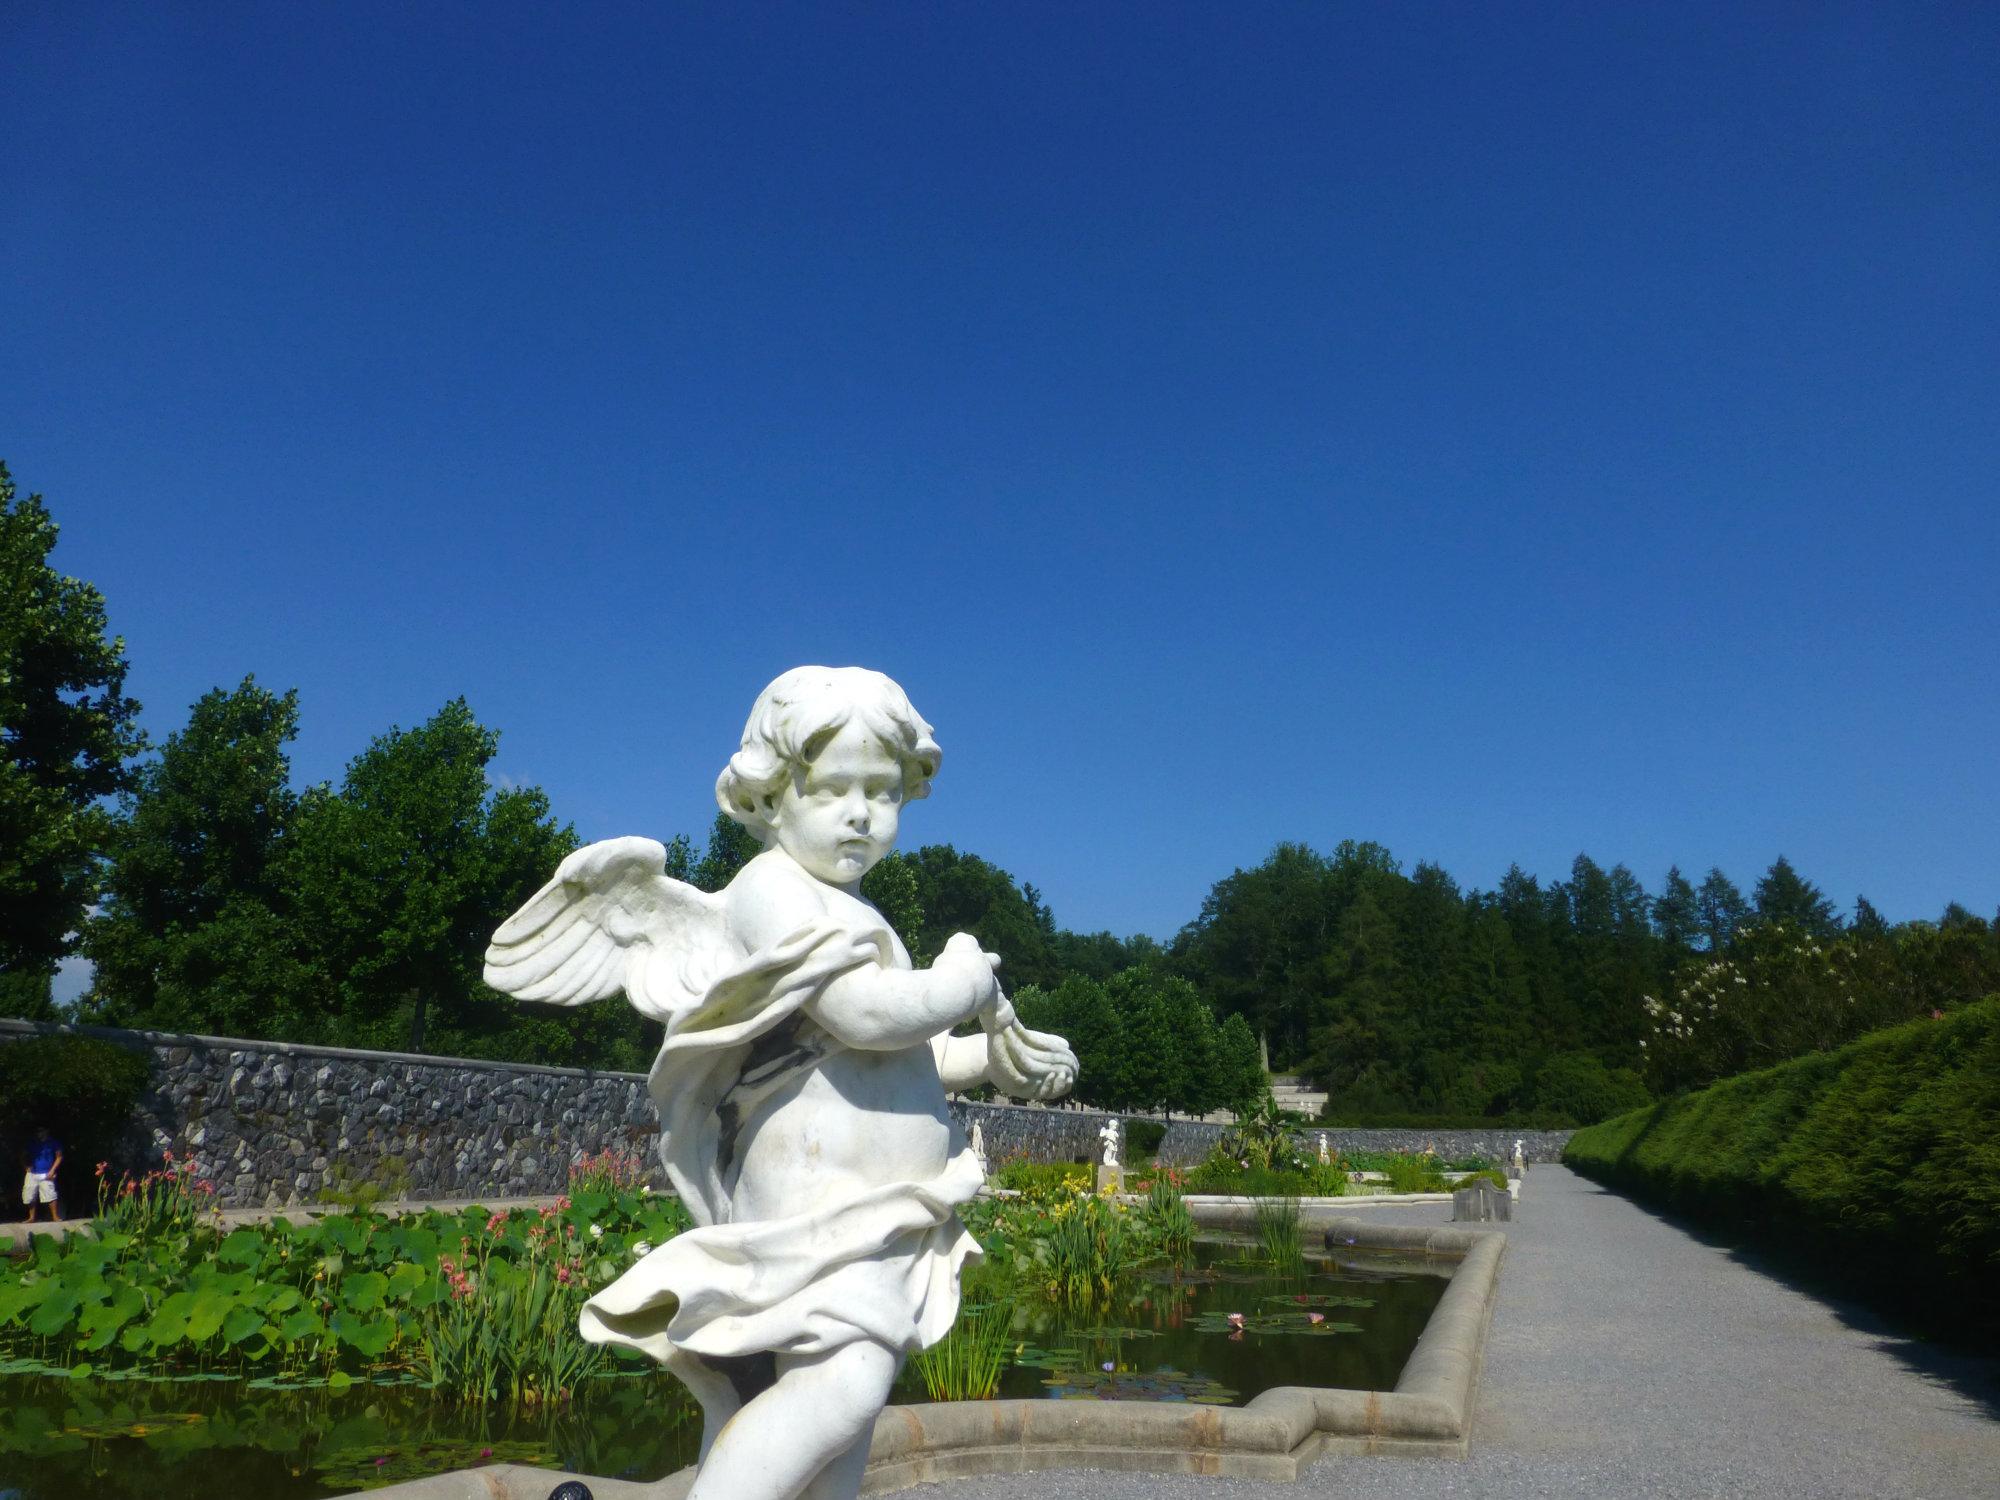 Biltmore Italian Garden Cherub Statue August 2012